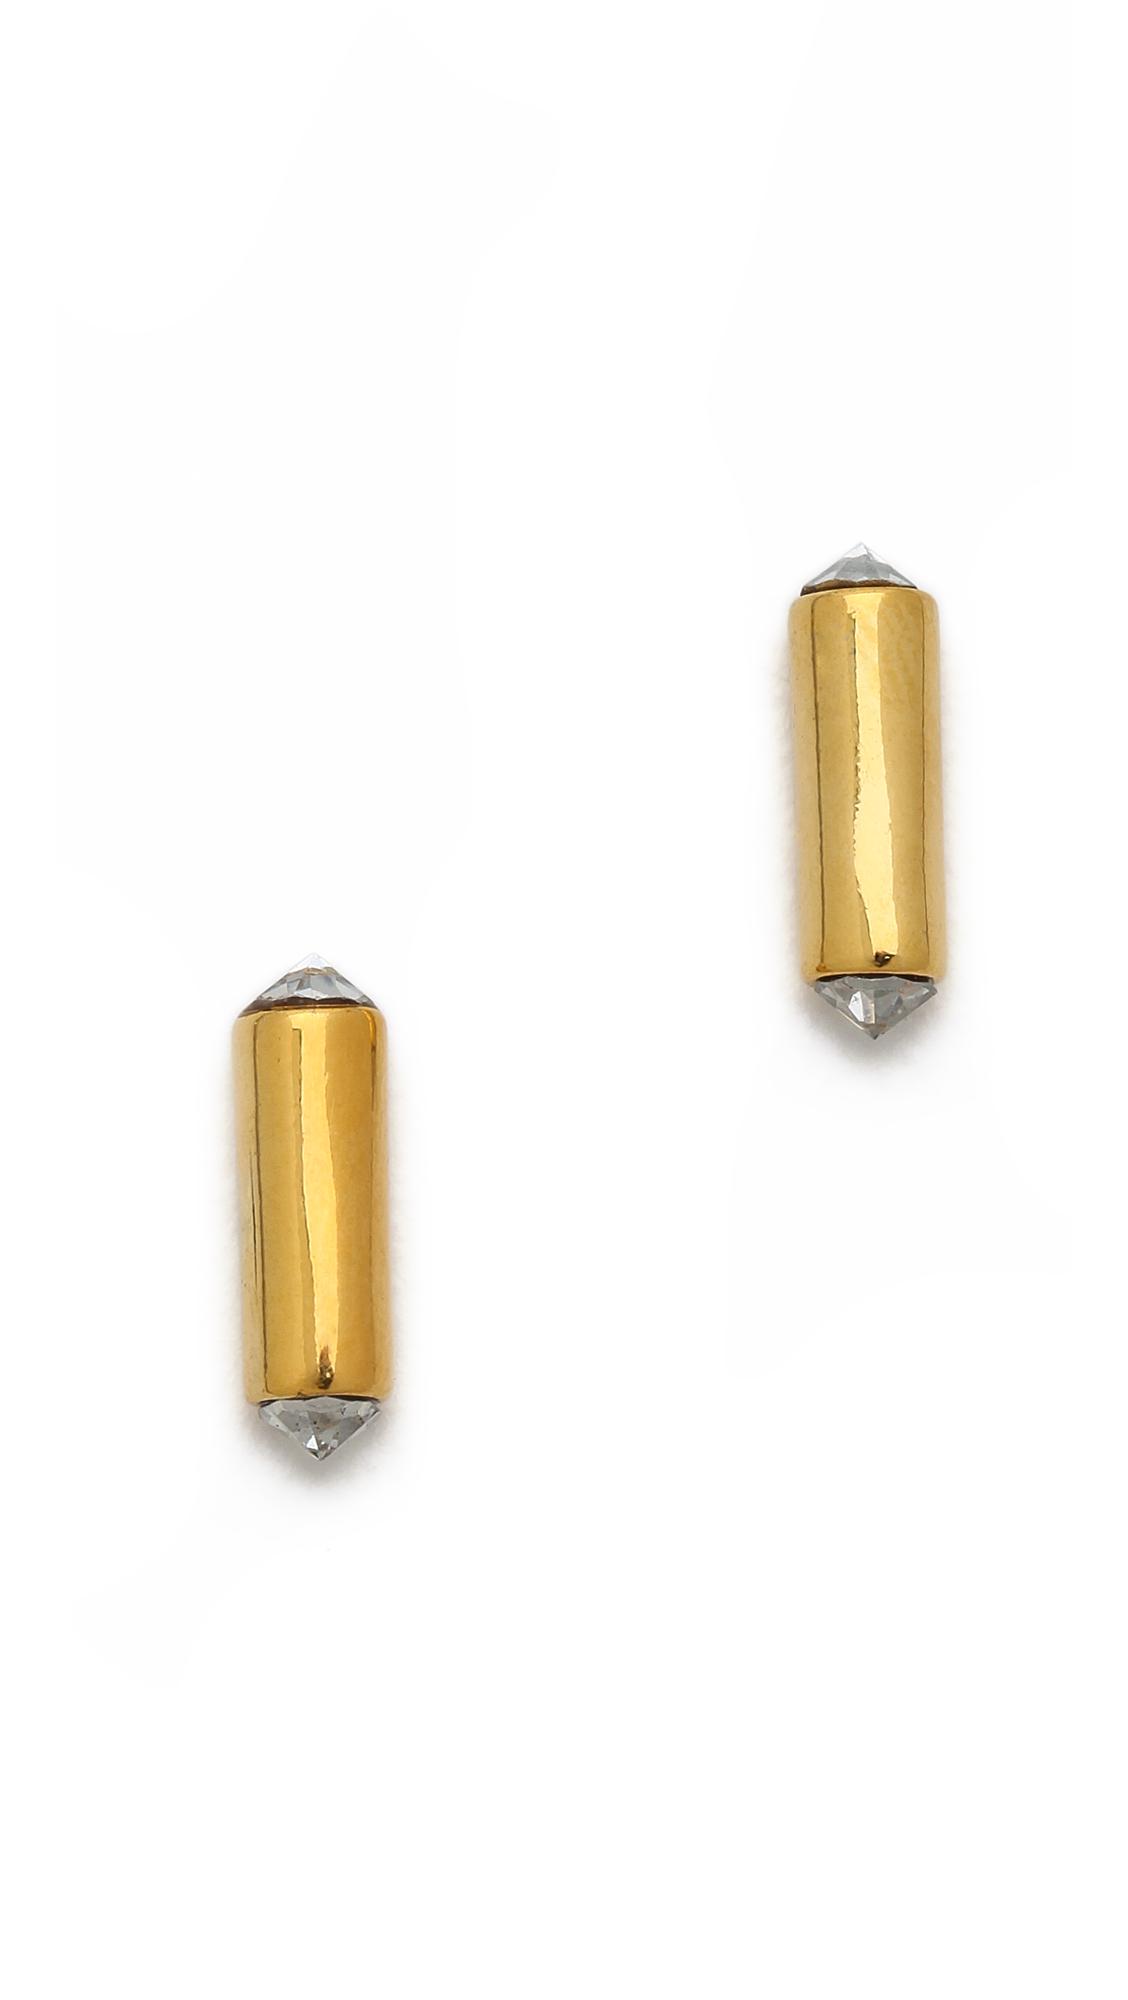 minkoff mini bar stud earrings in gold gold